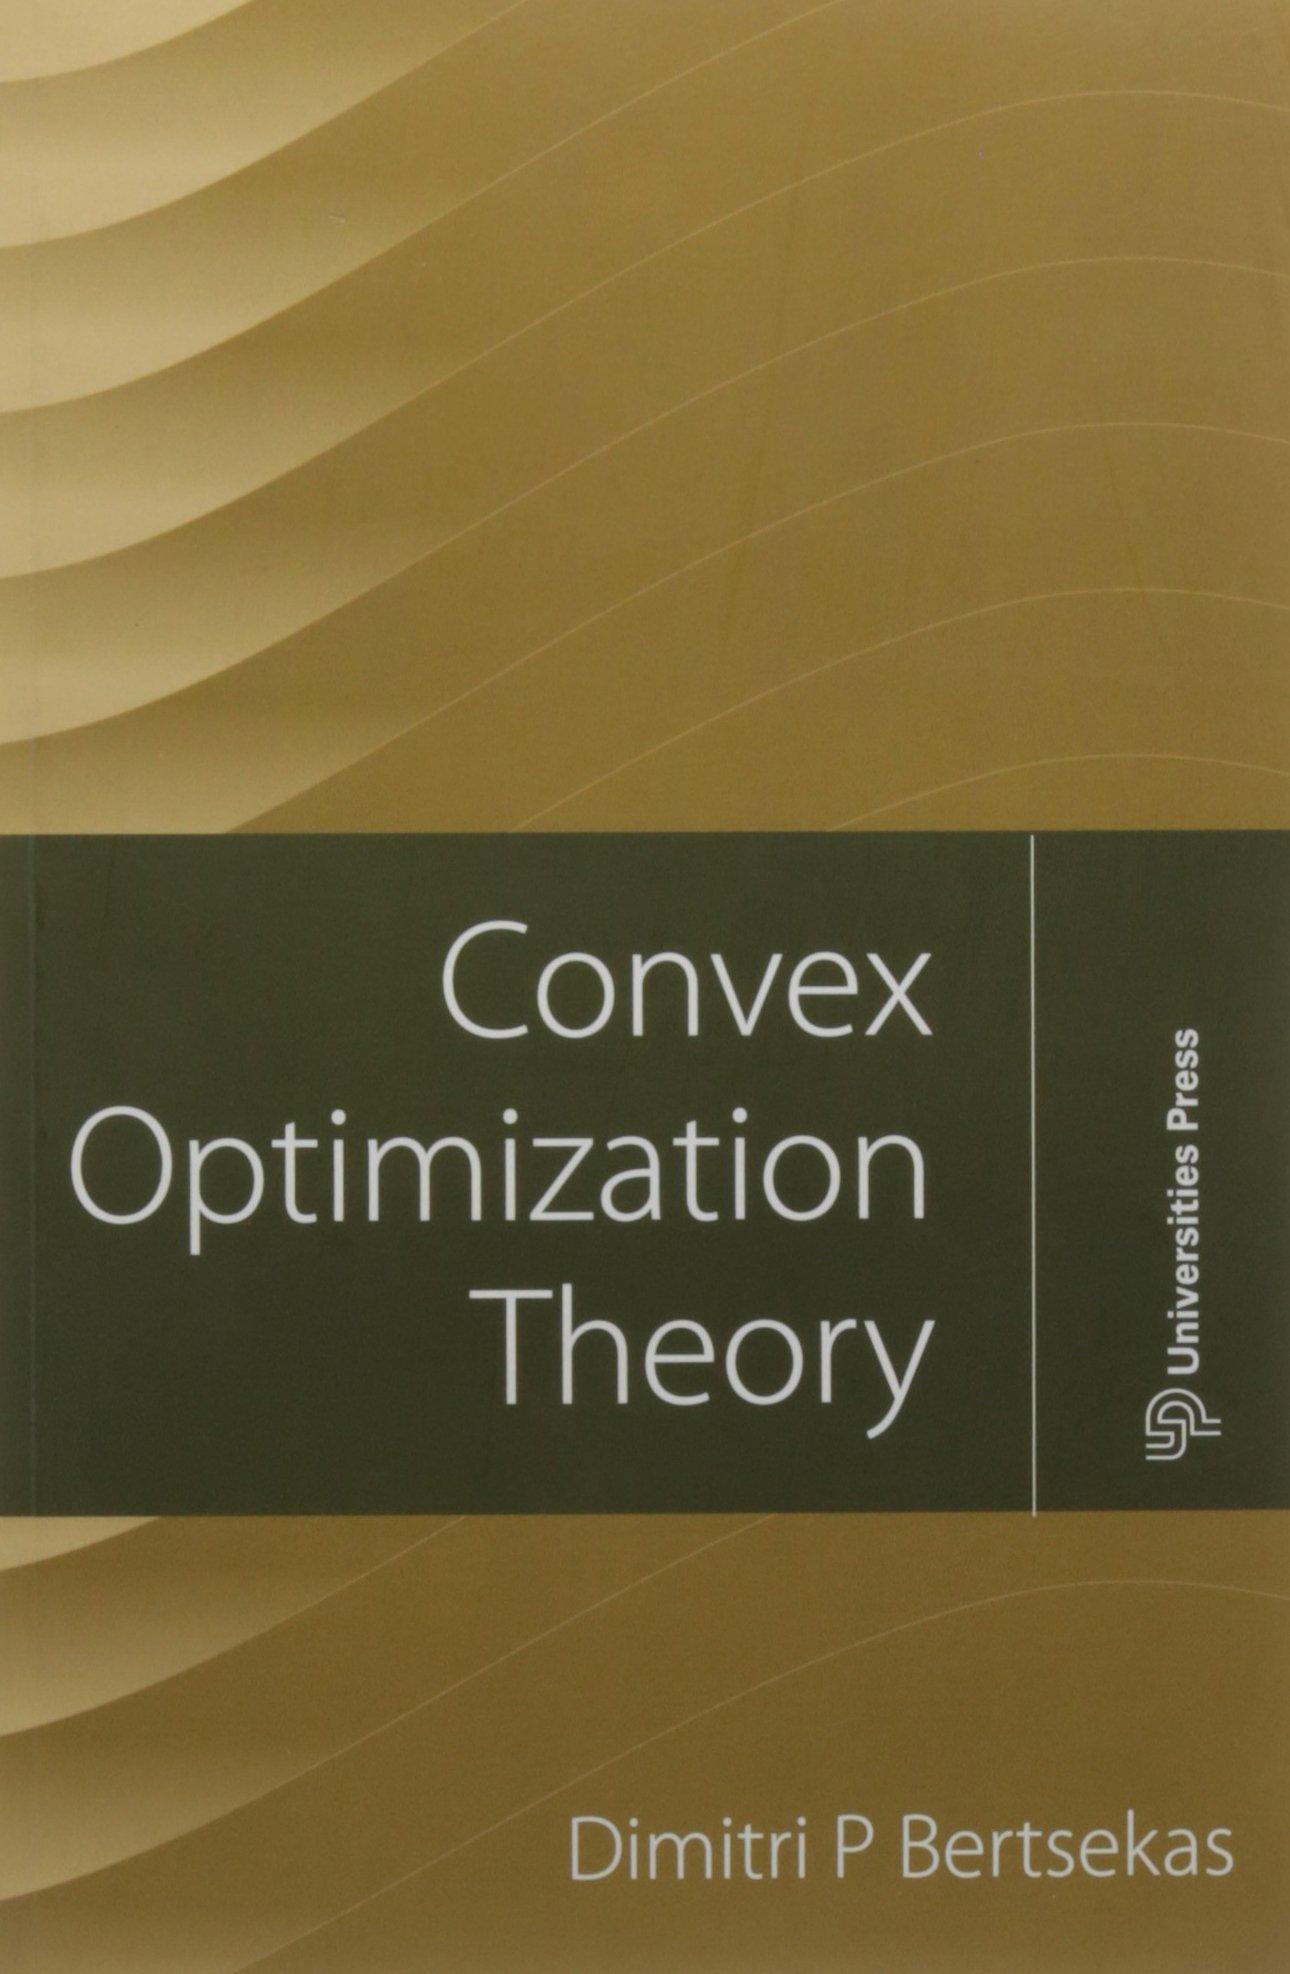 CONVEX OPTIMIZATION THEORY PDF DOWNLOAD